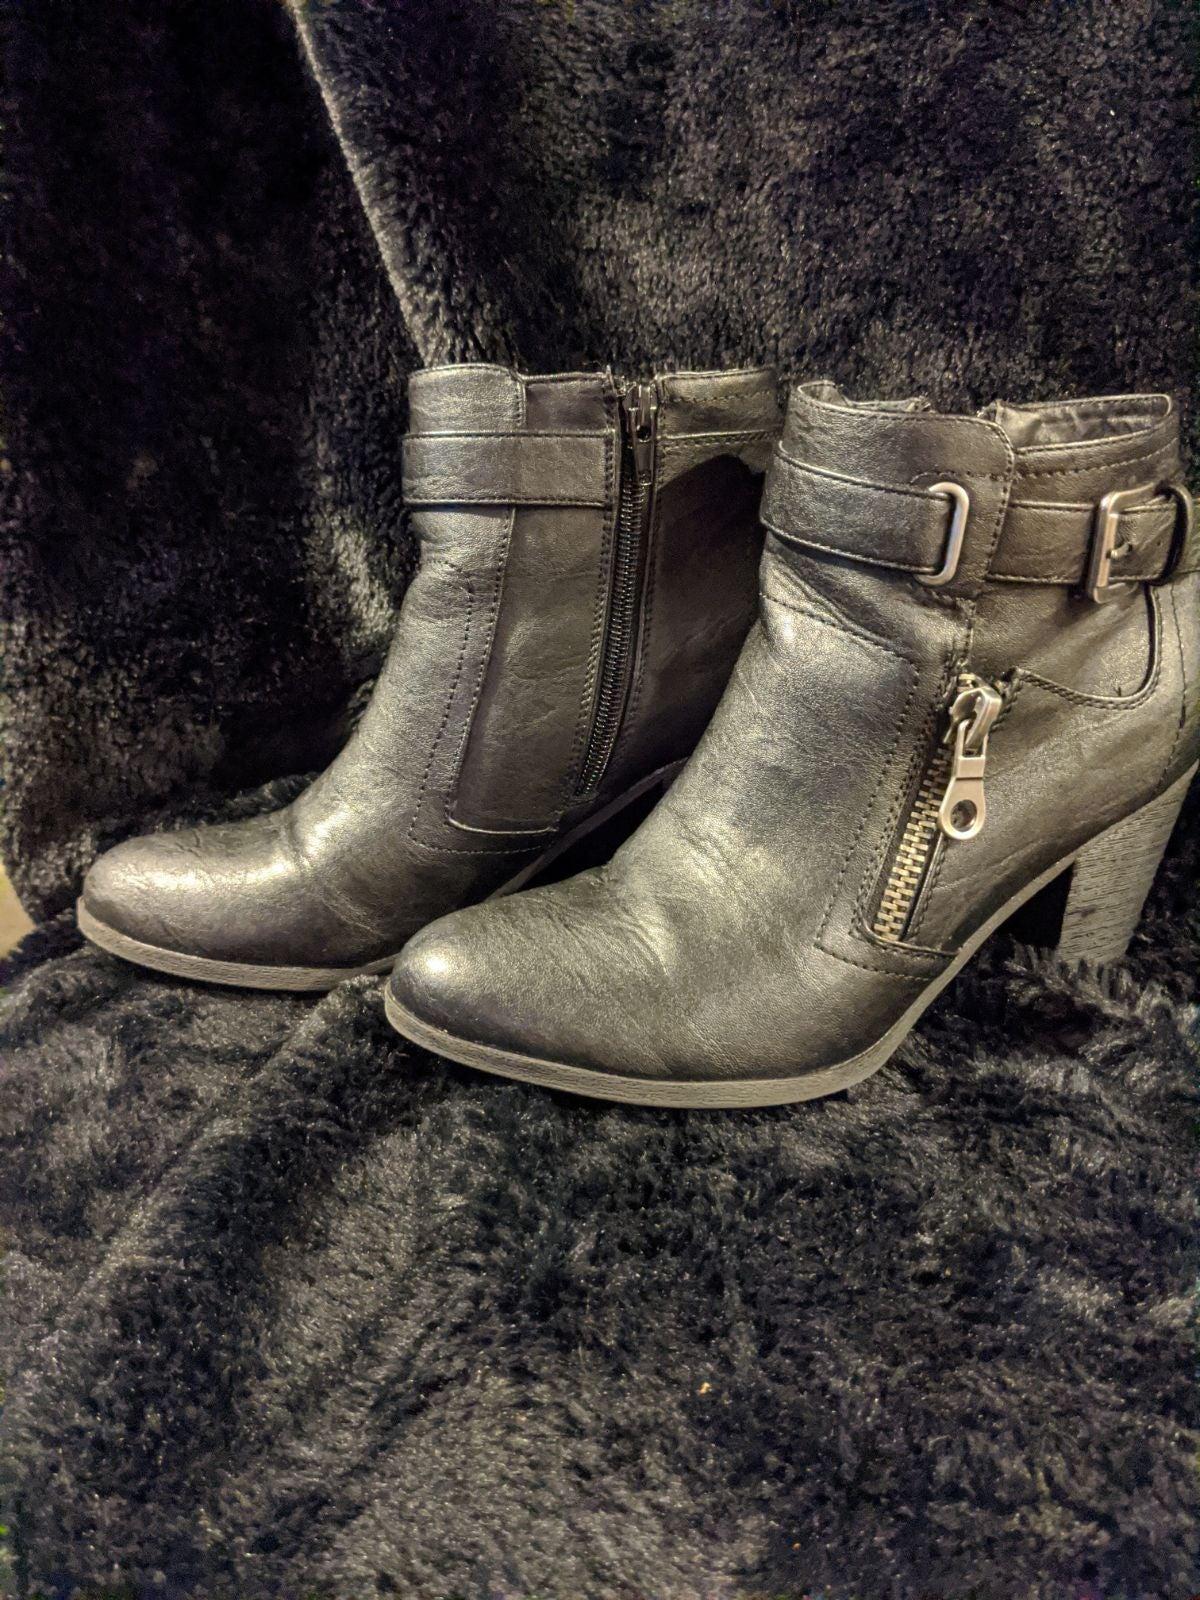 Indigo leather boots